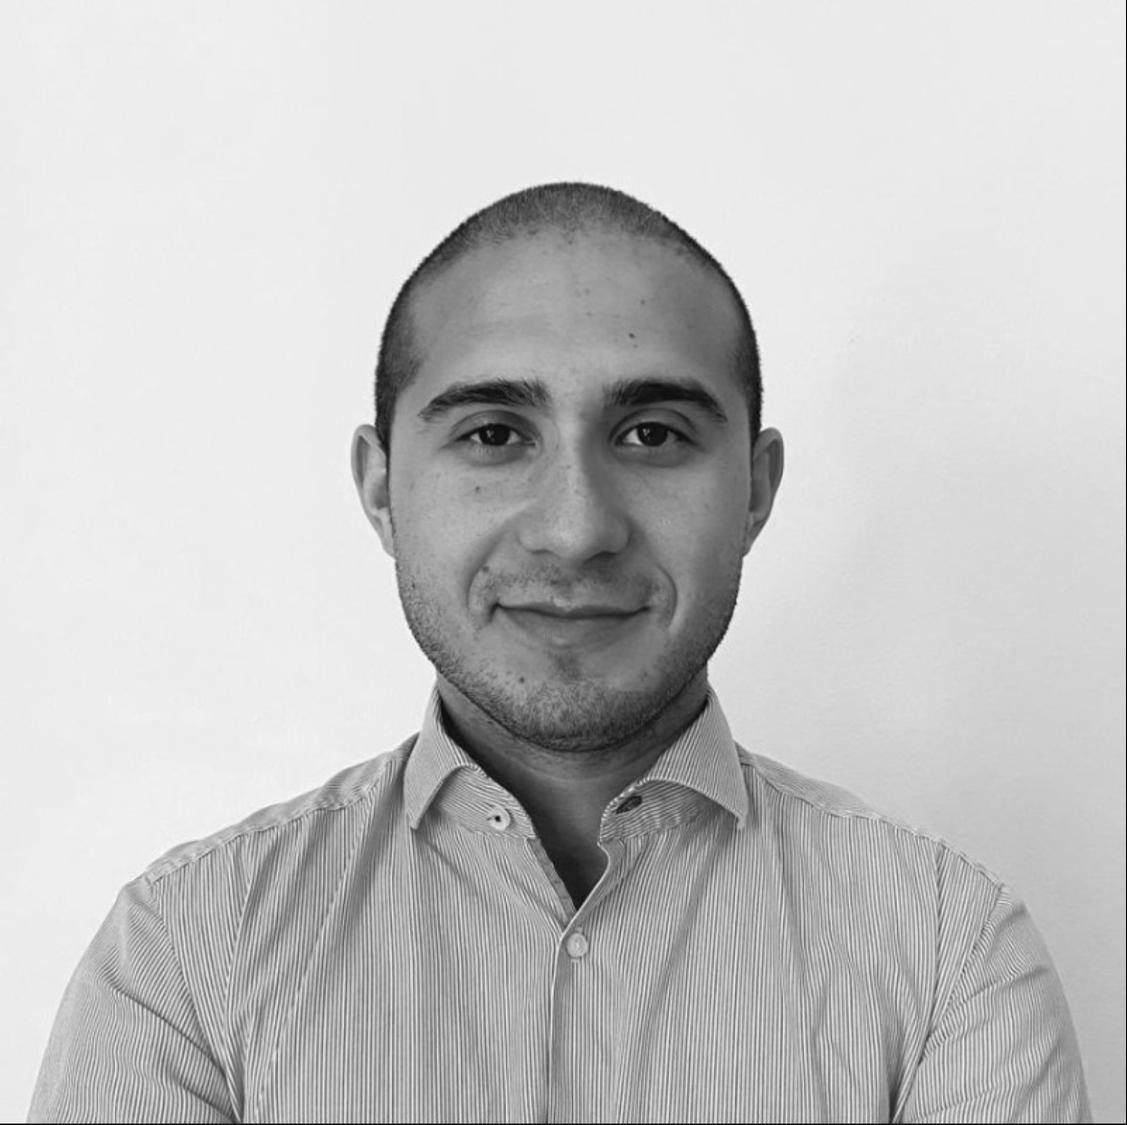 Karim Suhm